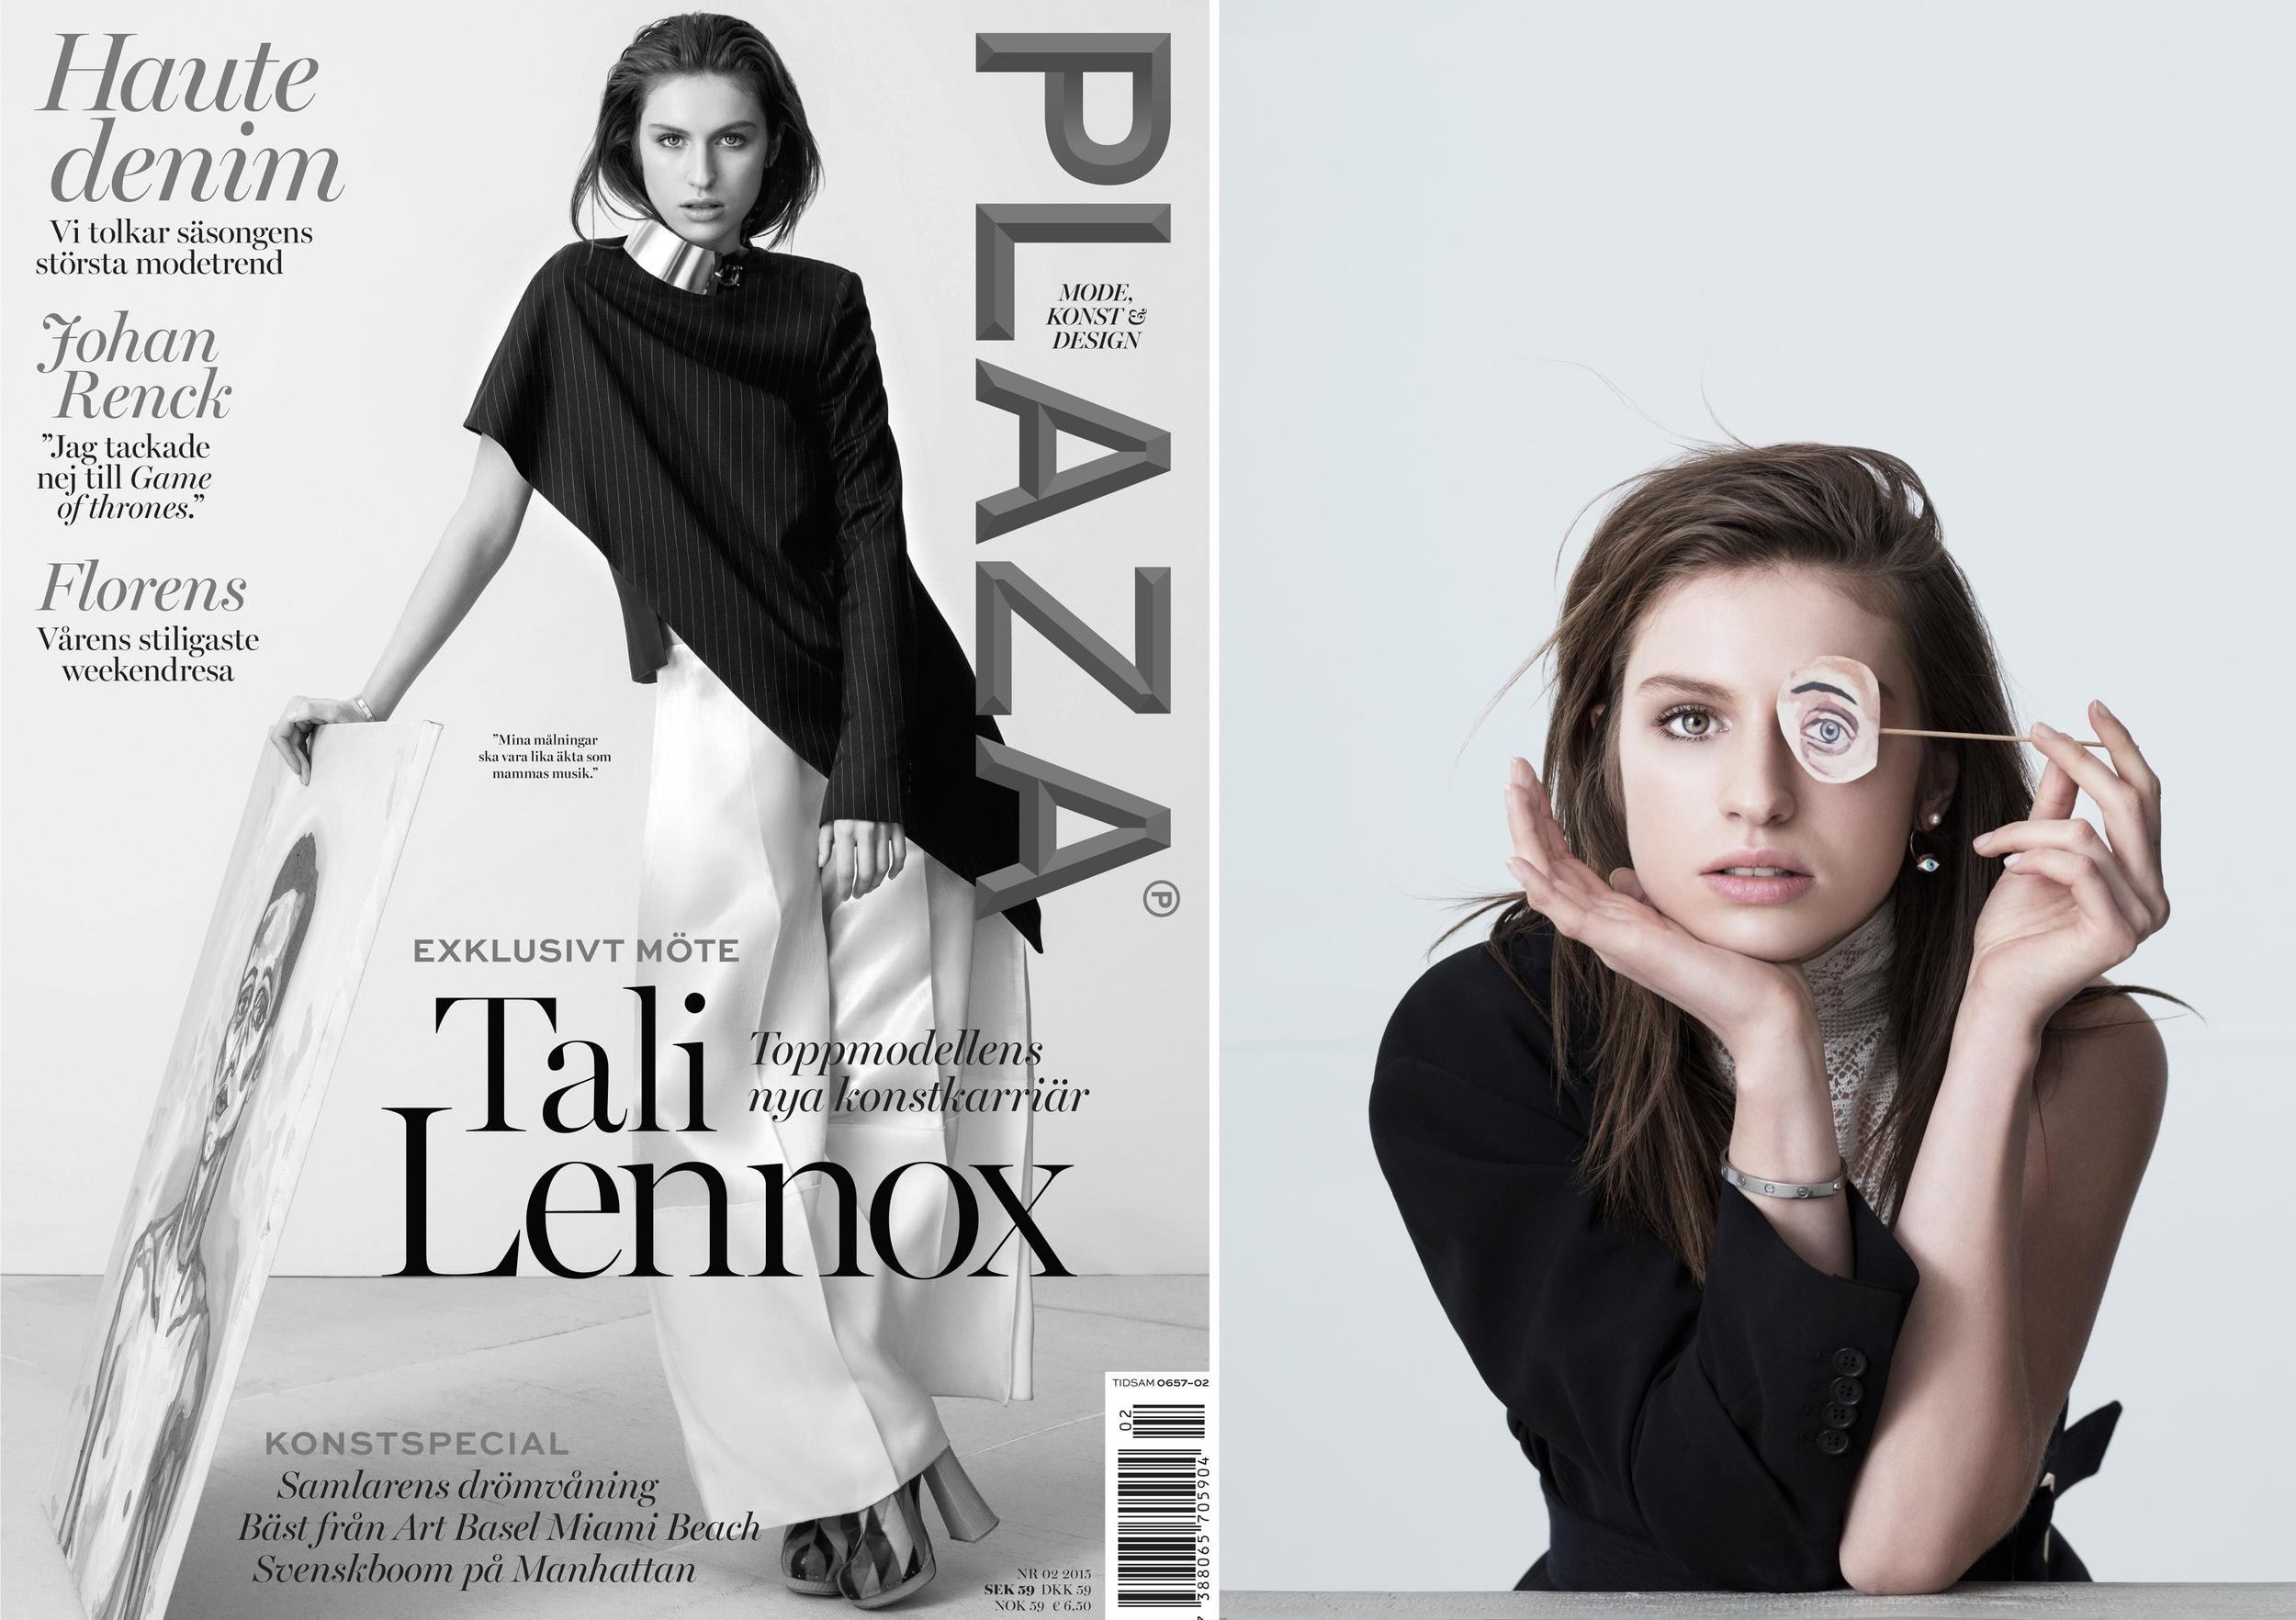 tali-lennox-plaza-magazine-cover-ellinor-stigle